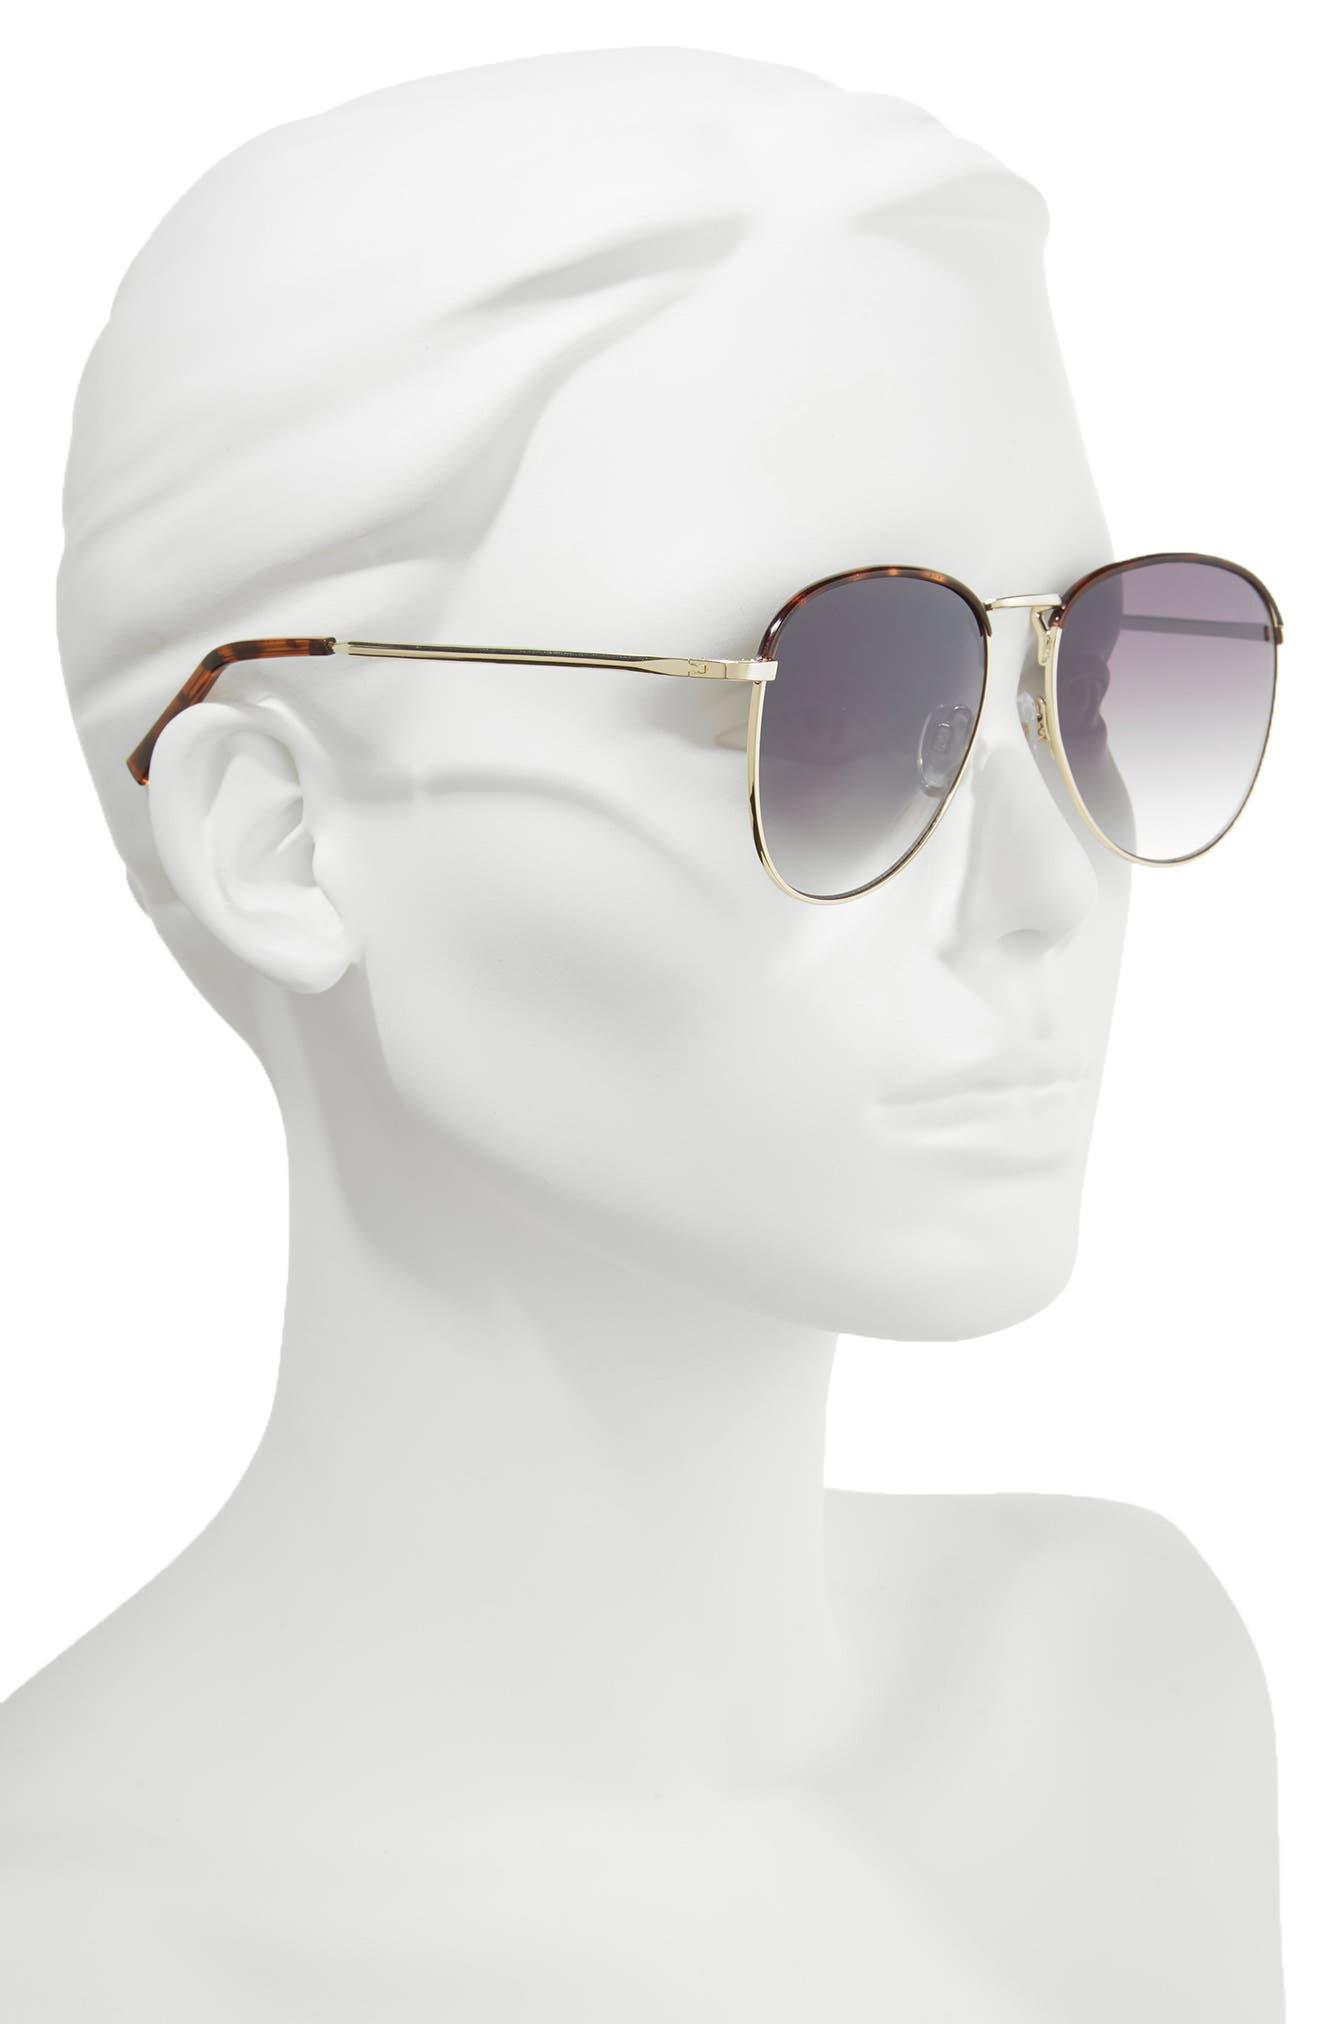 Clovelly 56mm Metal Sunglasses,                             Alternate thumbnail 2, color,                             DARK TORT